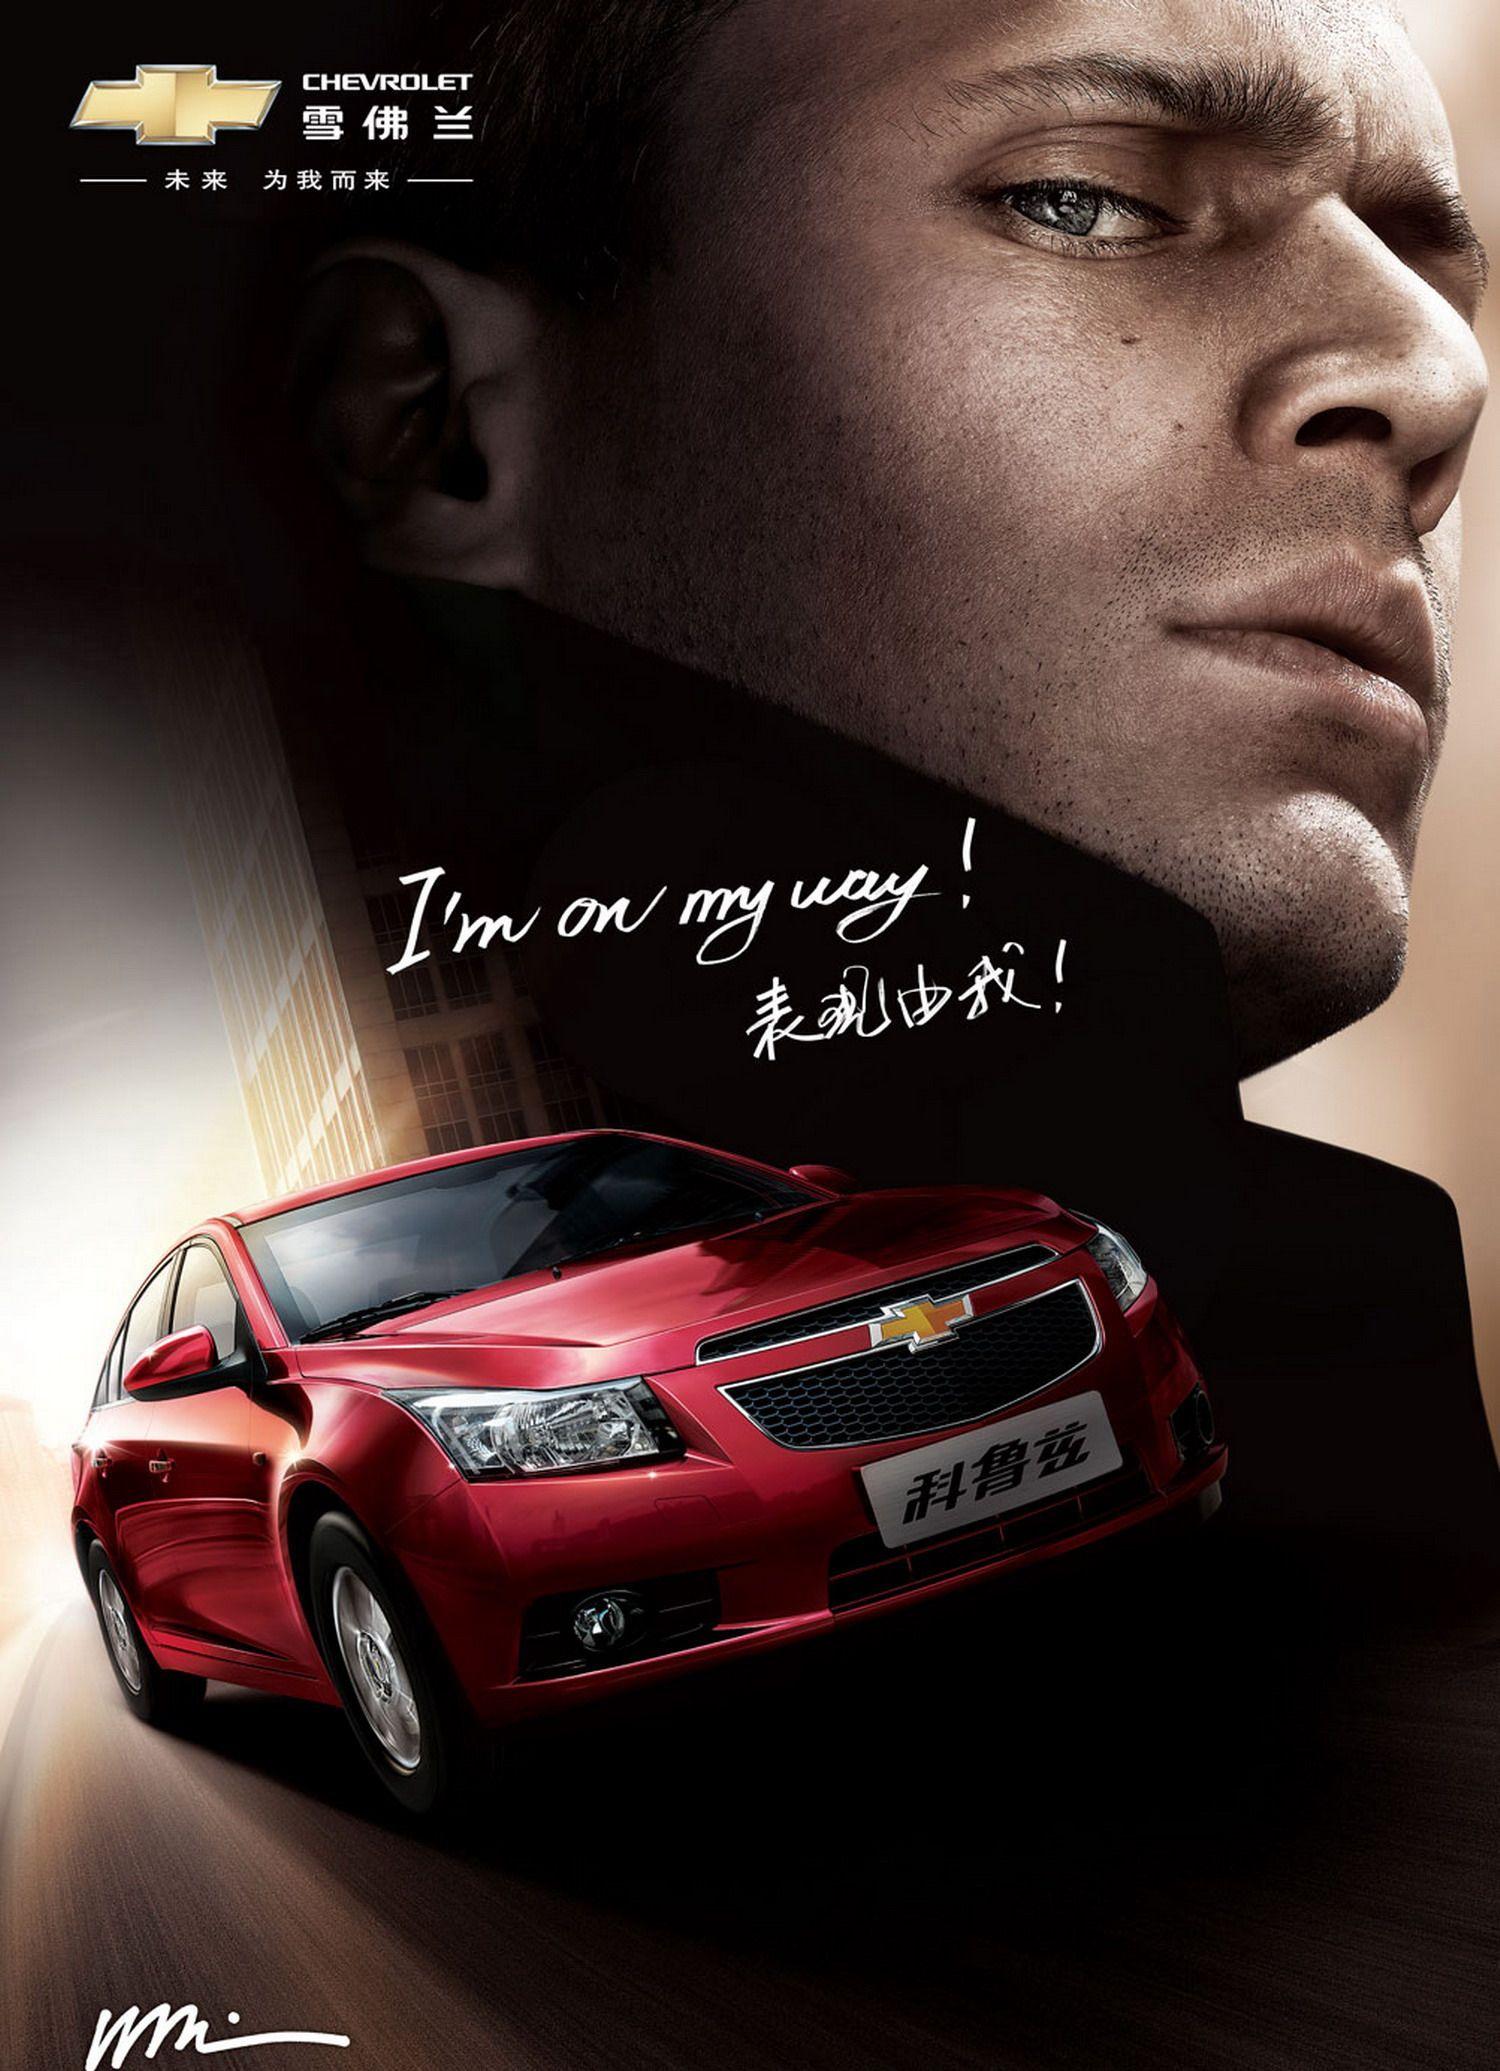 Wentworth Miller Gm Chevrolet Adverts 2009 Chevrolet Celebrities Photoshoot